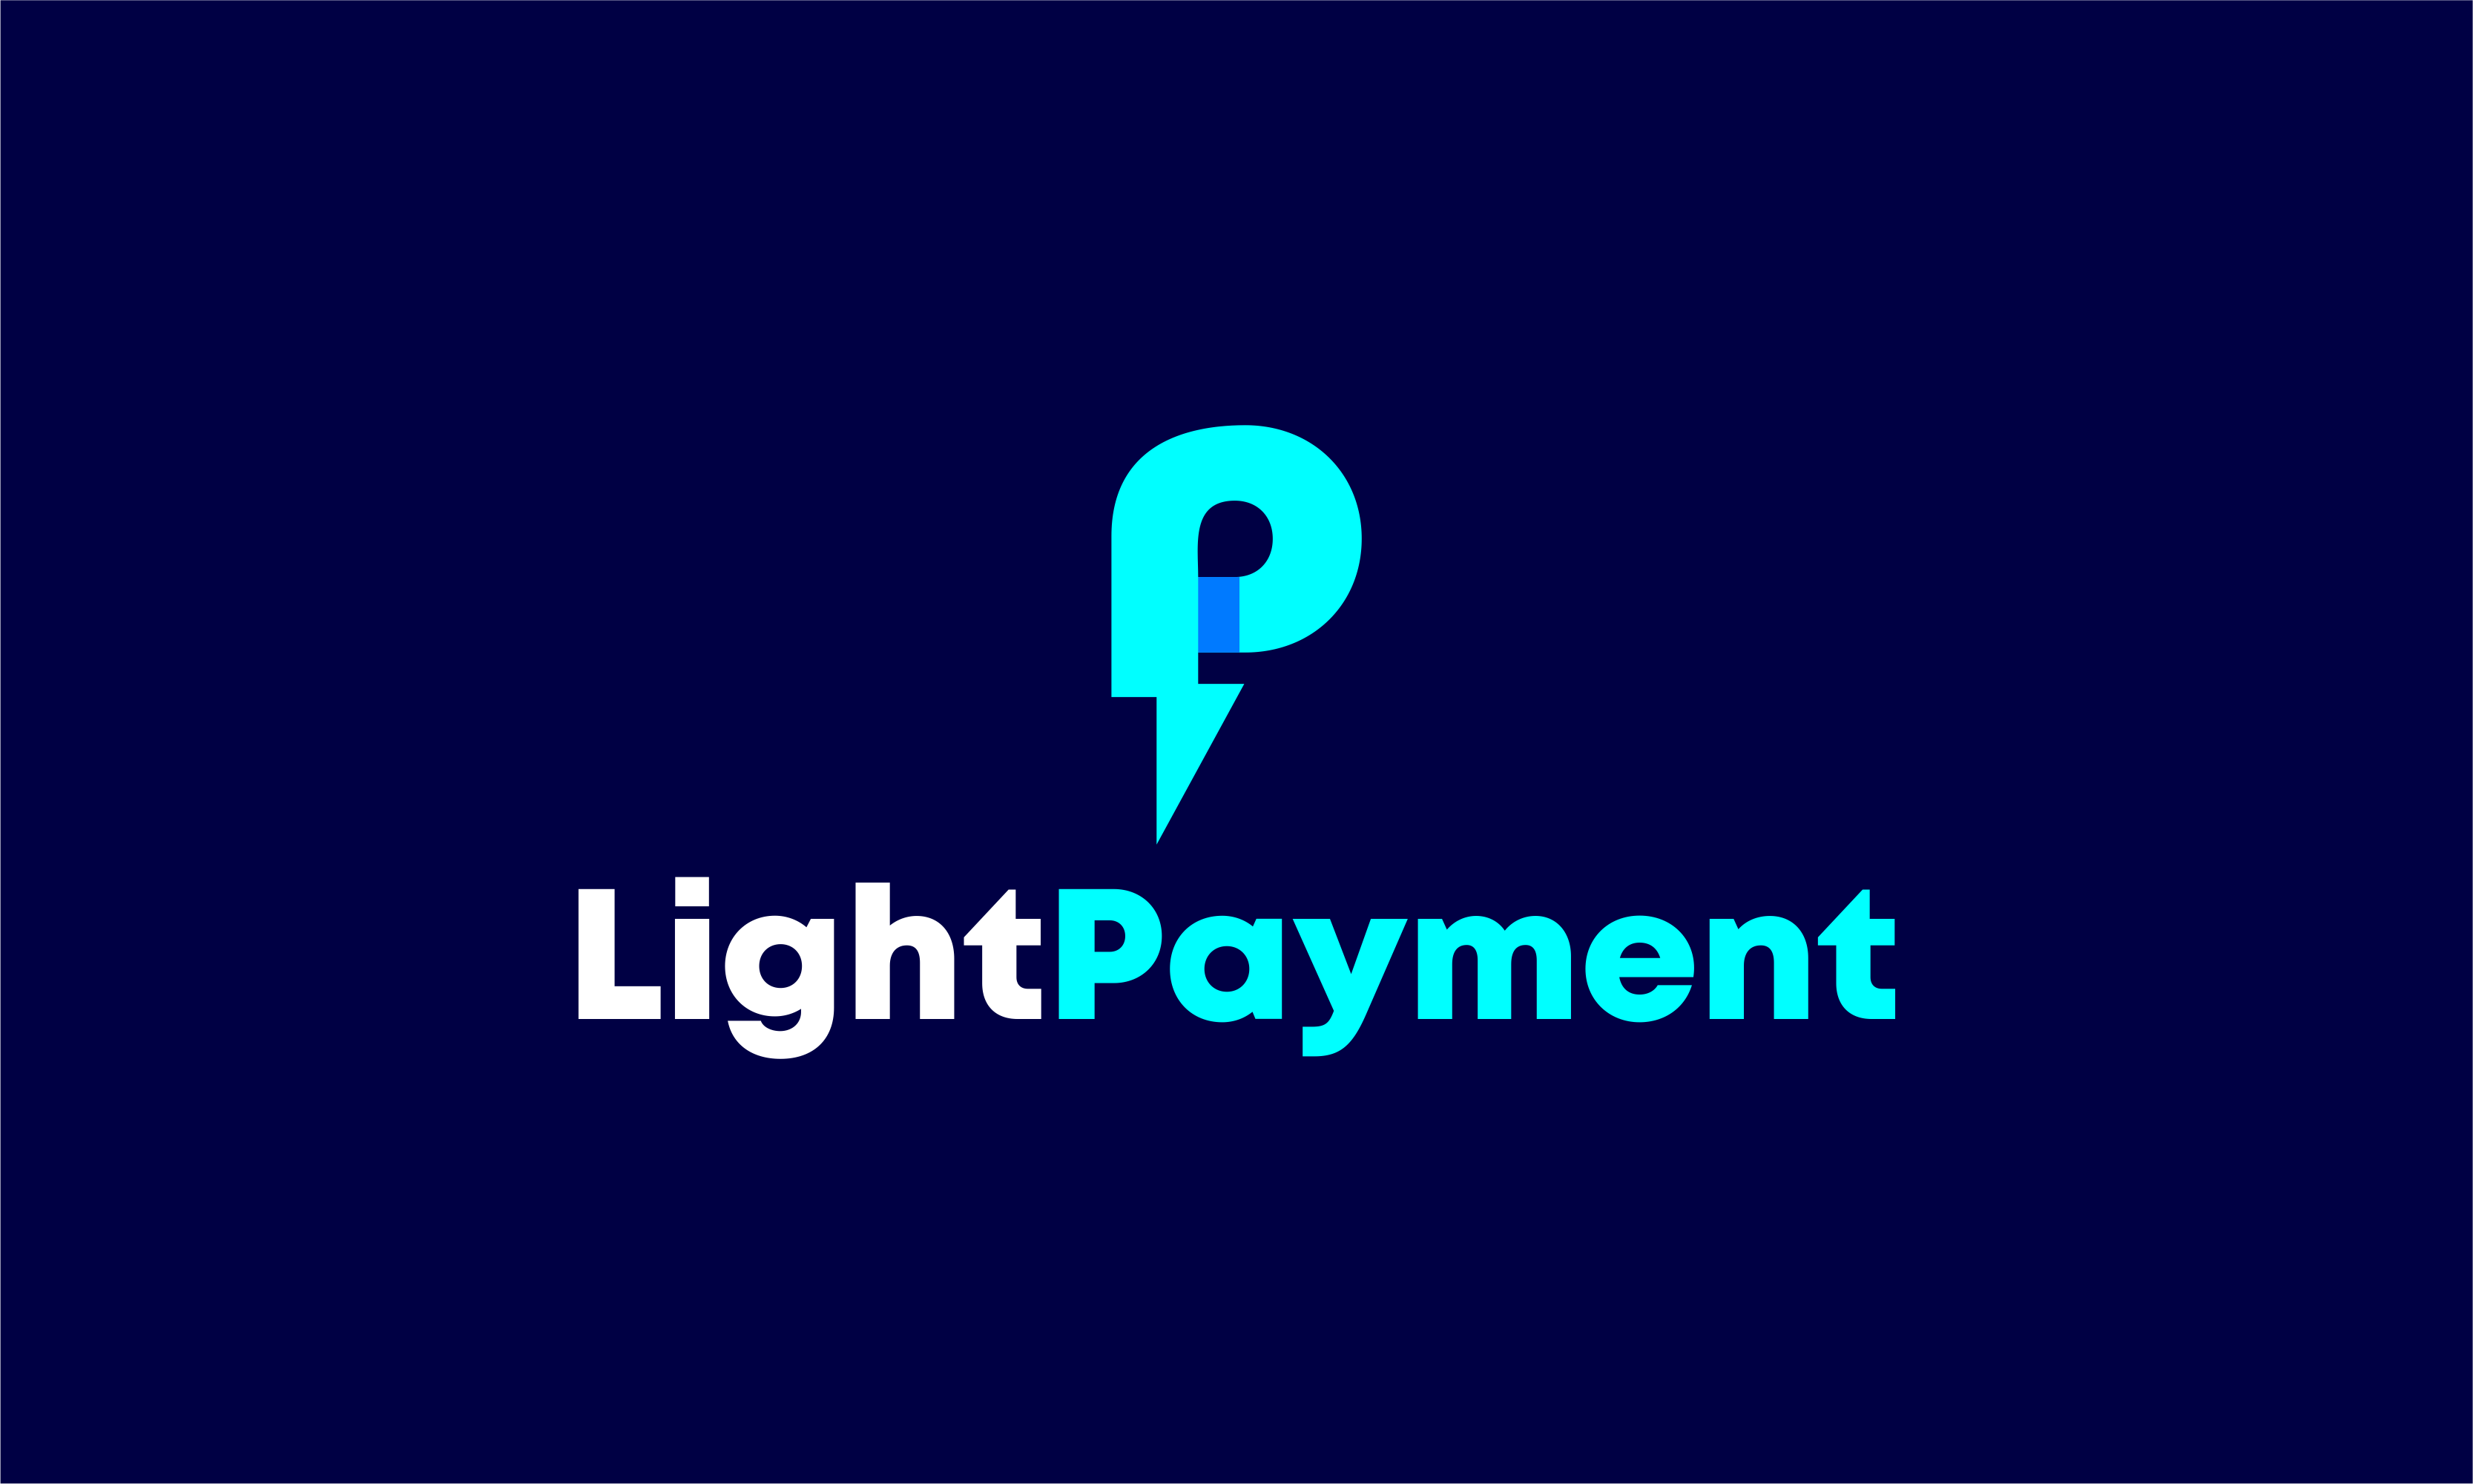 Lightpayment